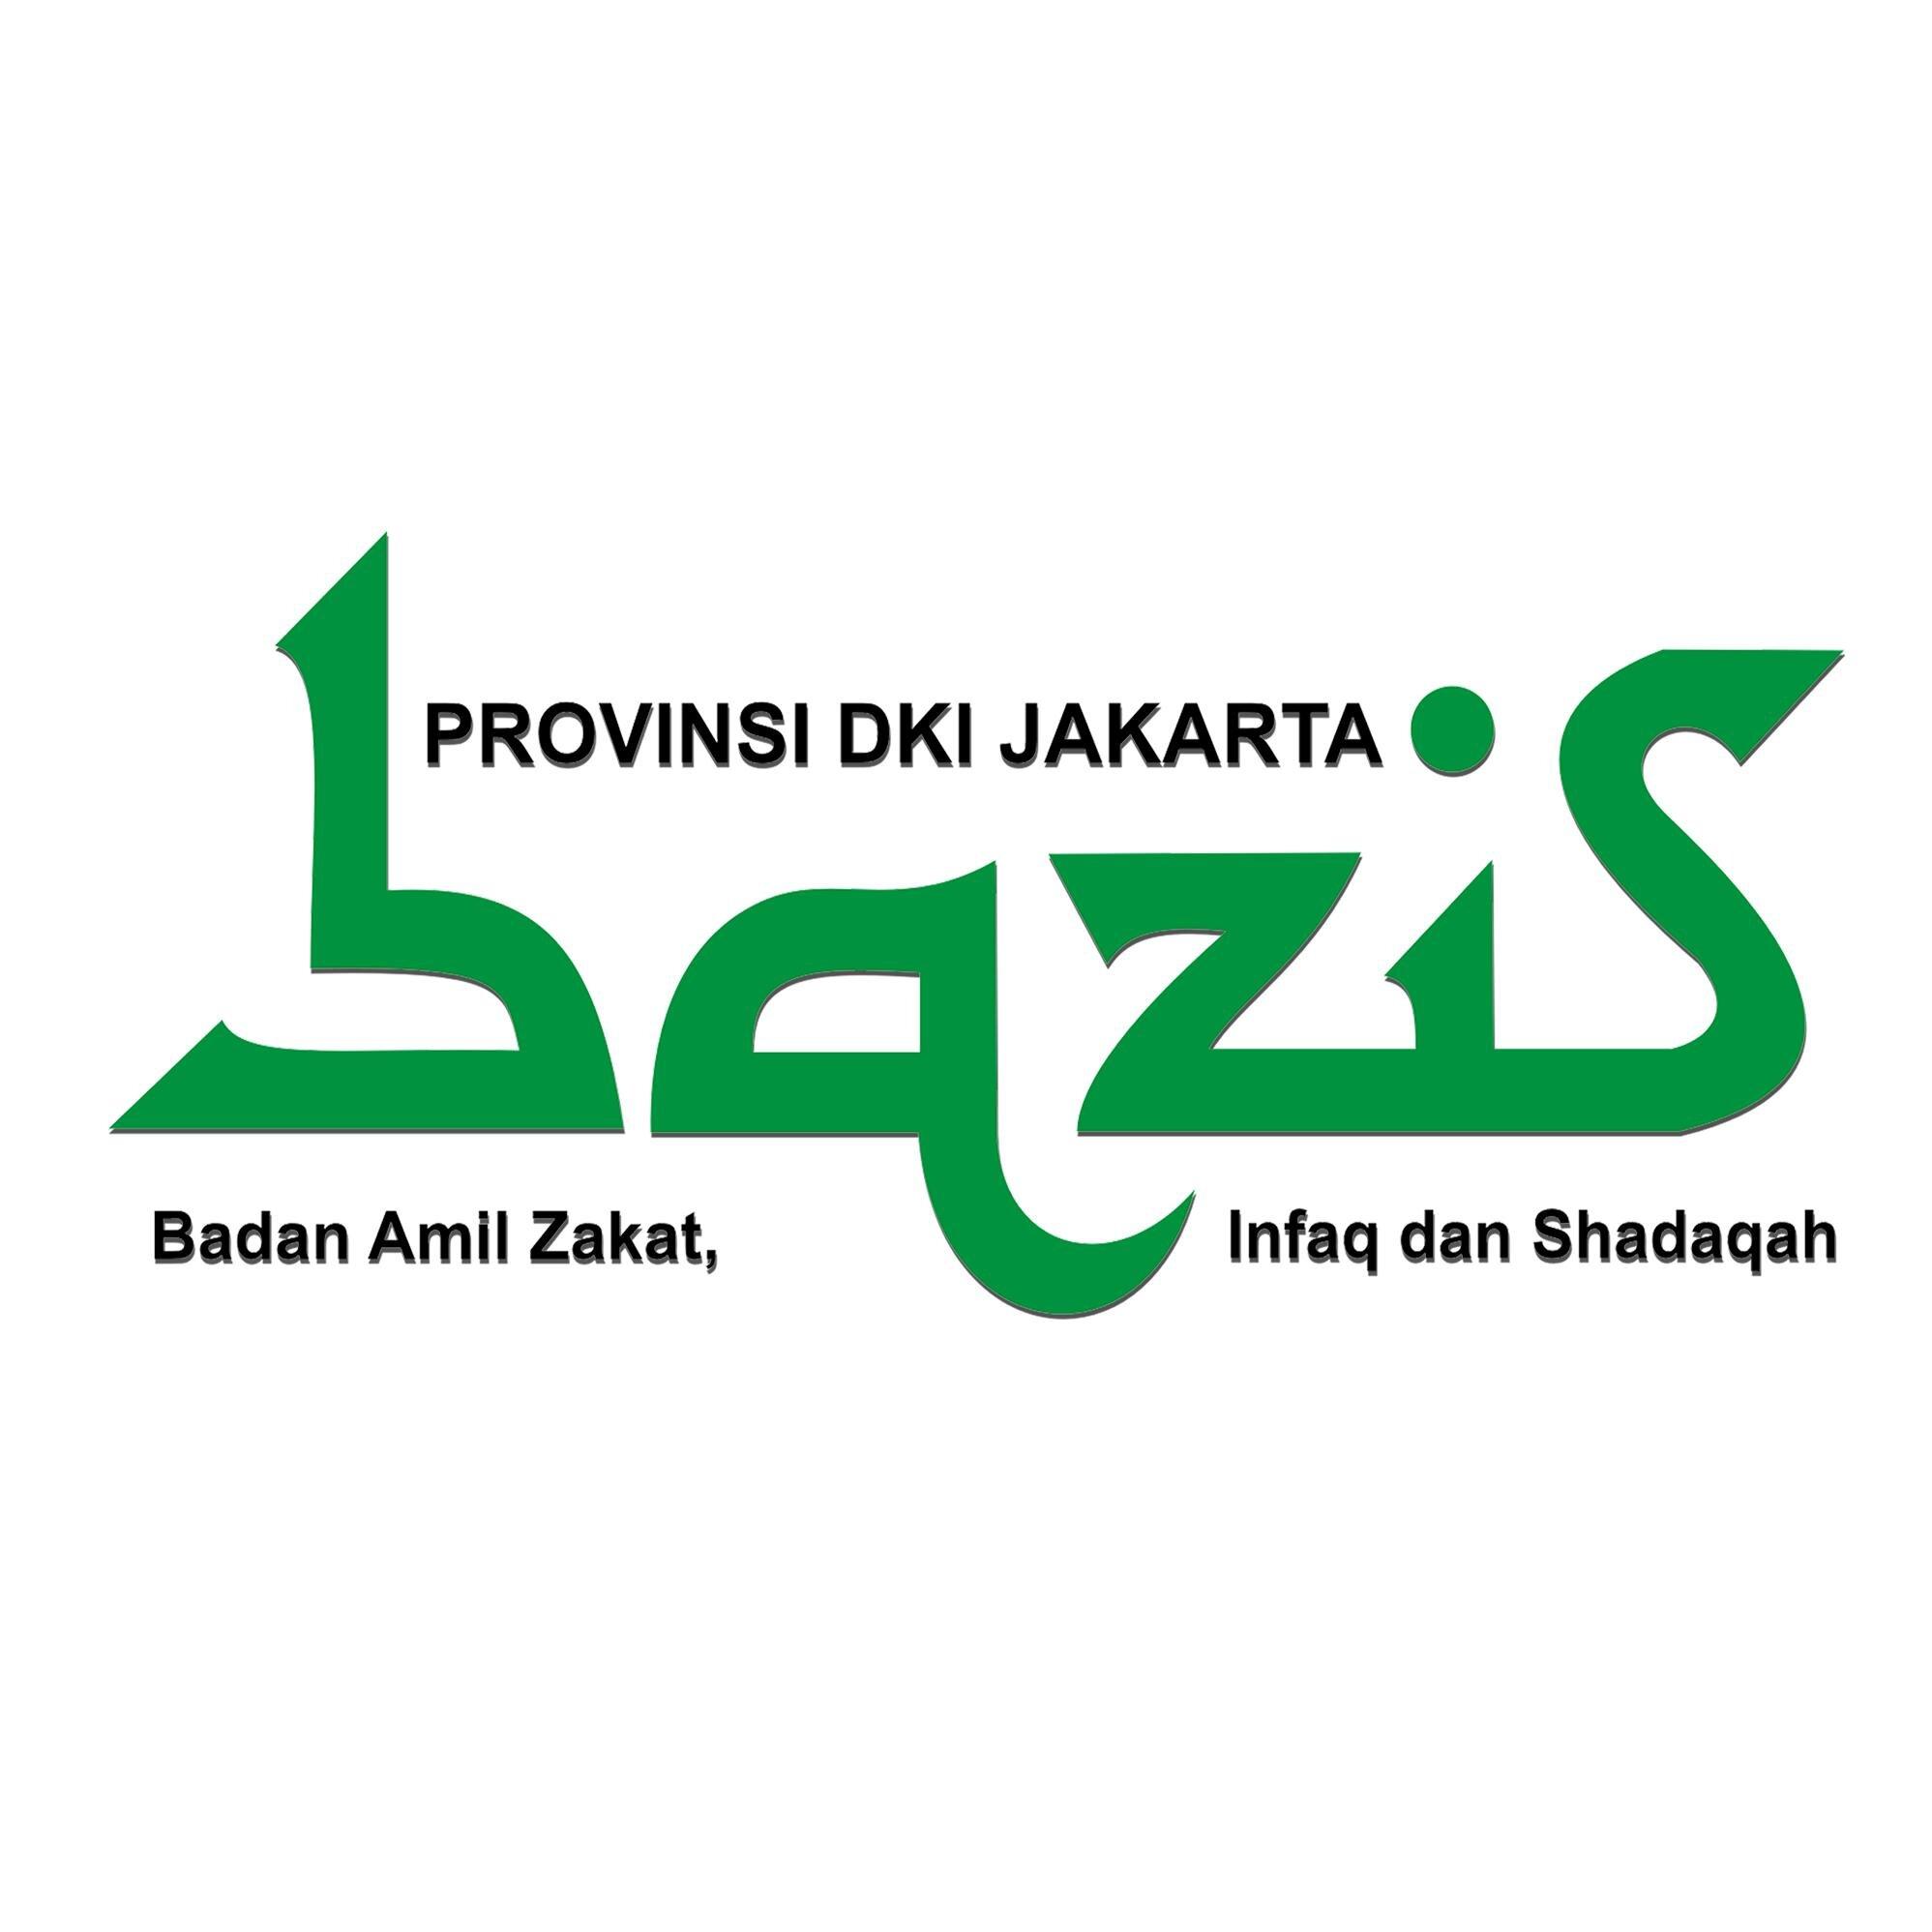 Bazis Logo photo - 1